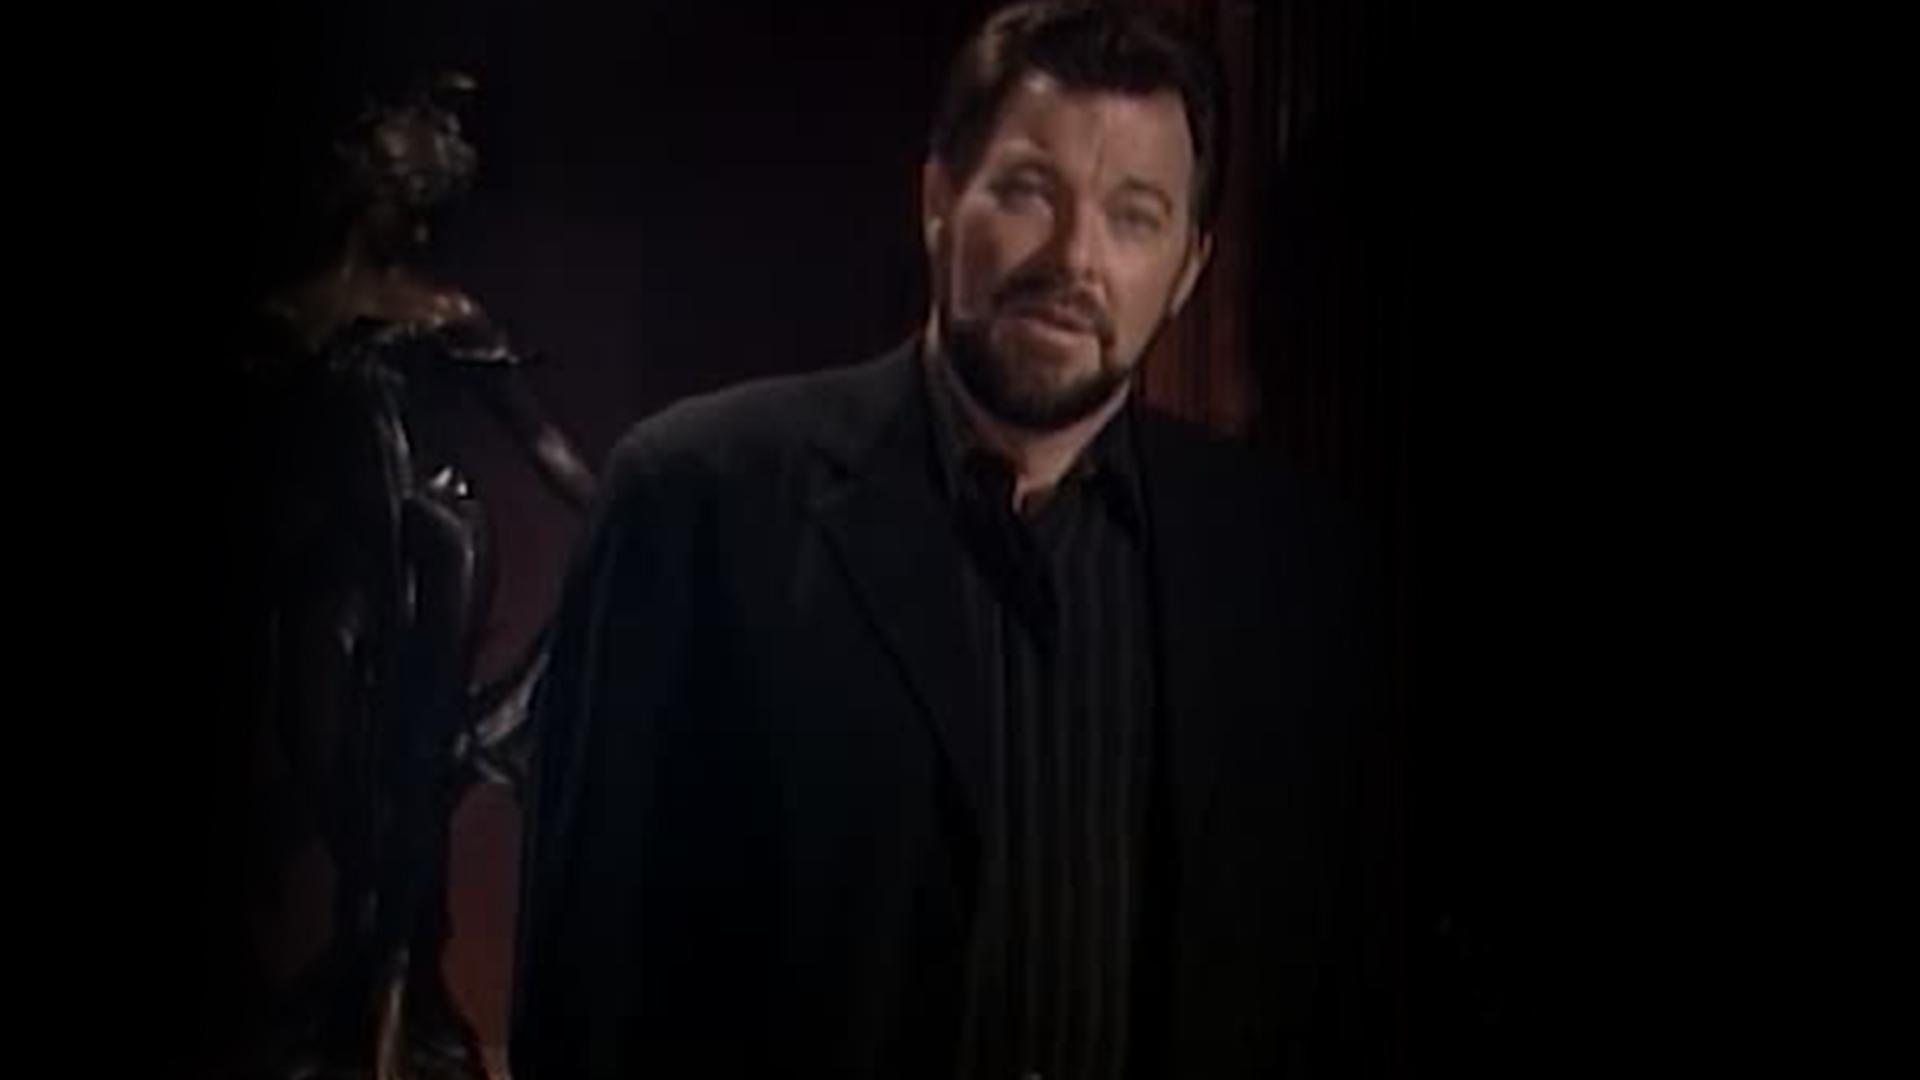 Beyond Belief: Fact or Fiction - Season 3